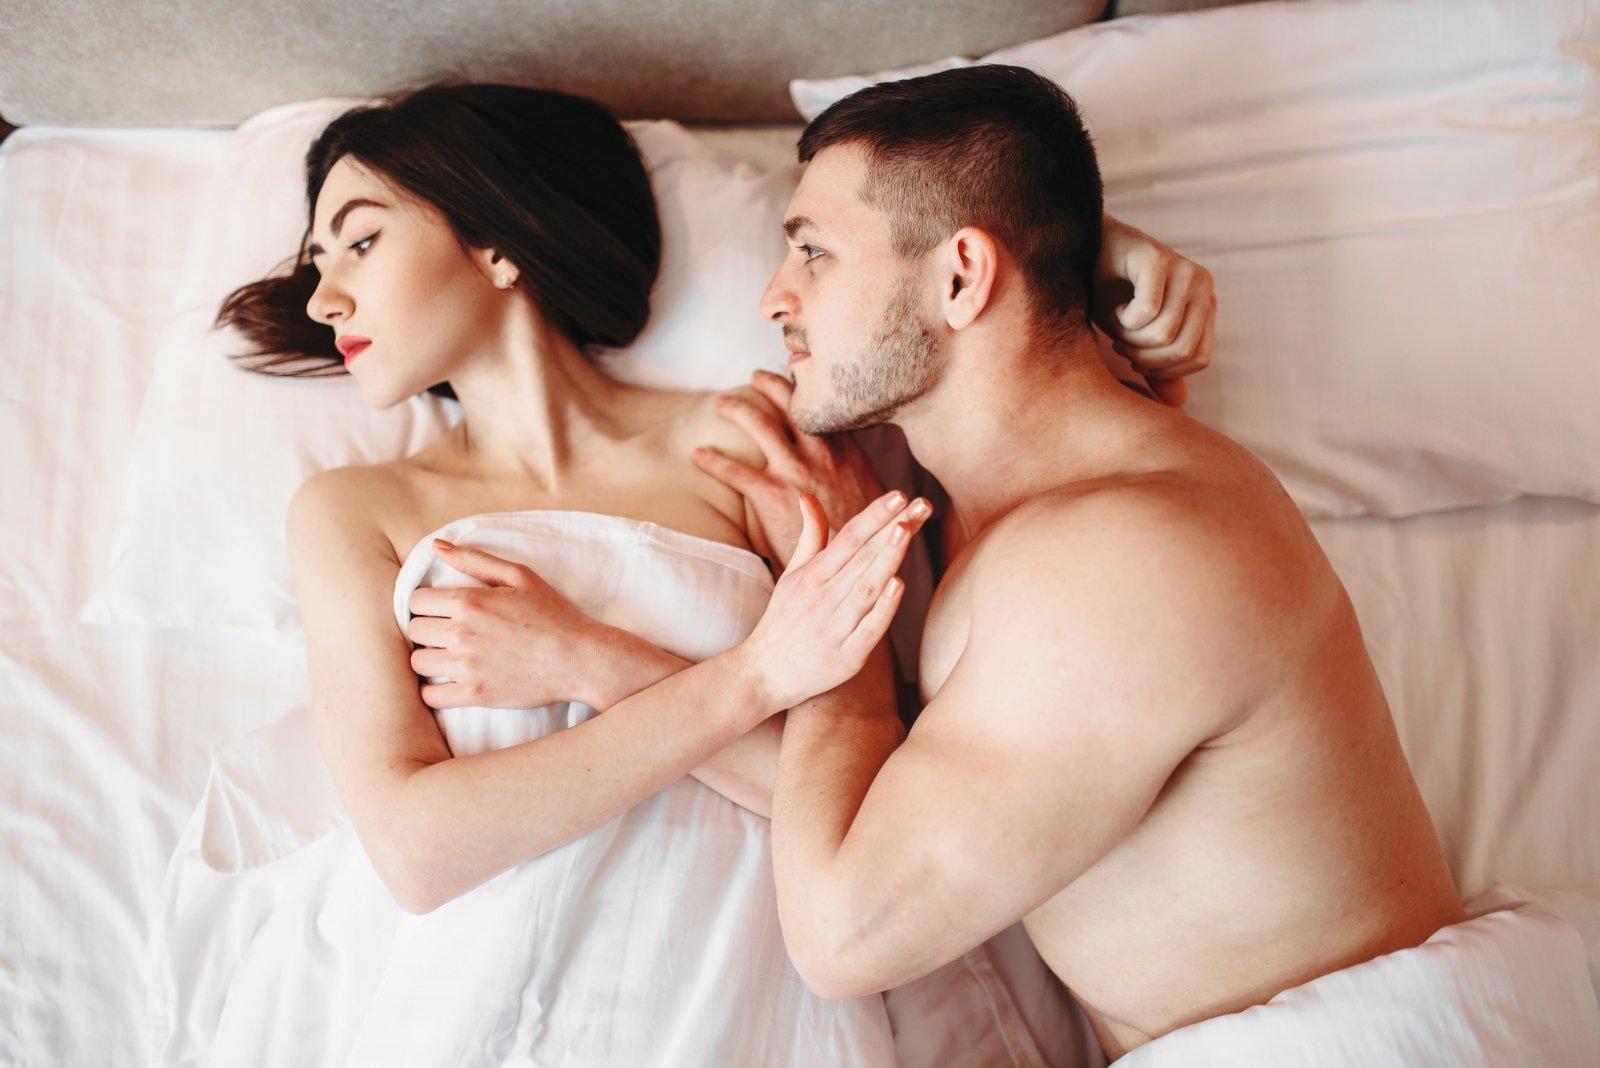 Hypoactive sexual desire disorder causes low libido in women